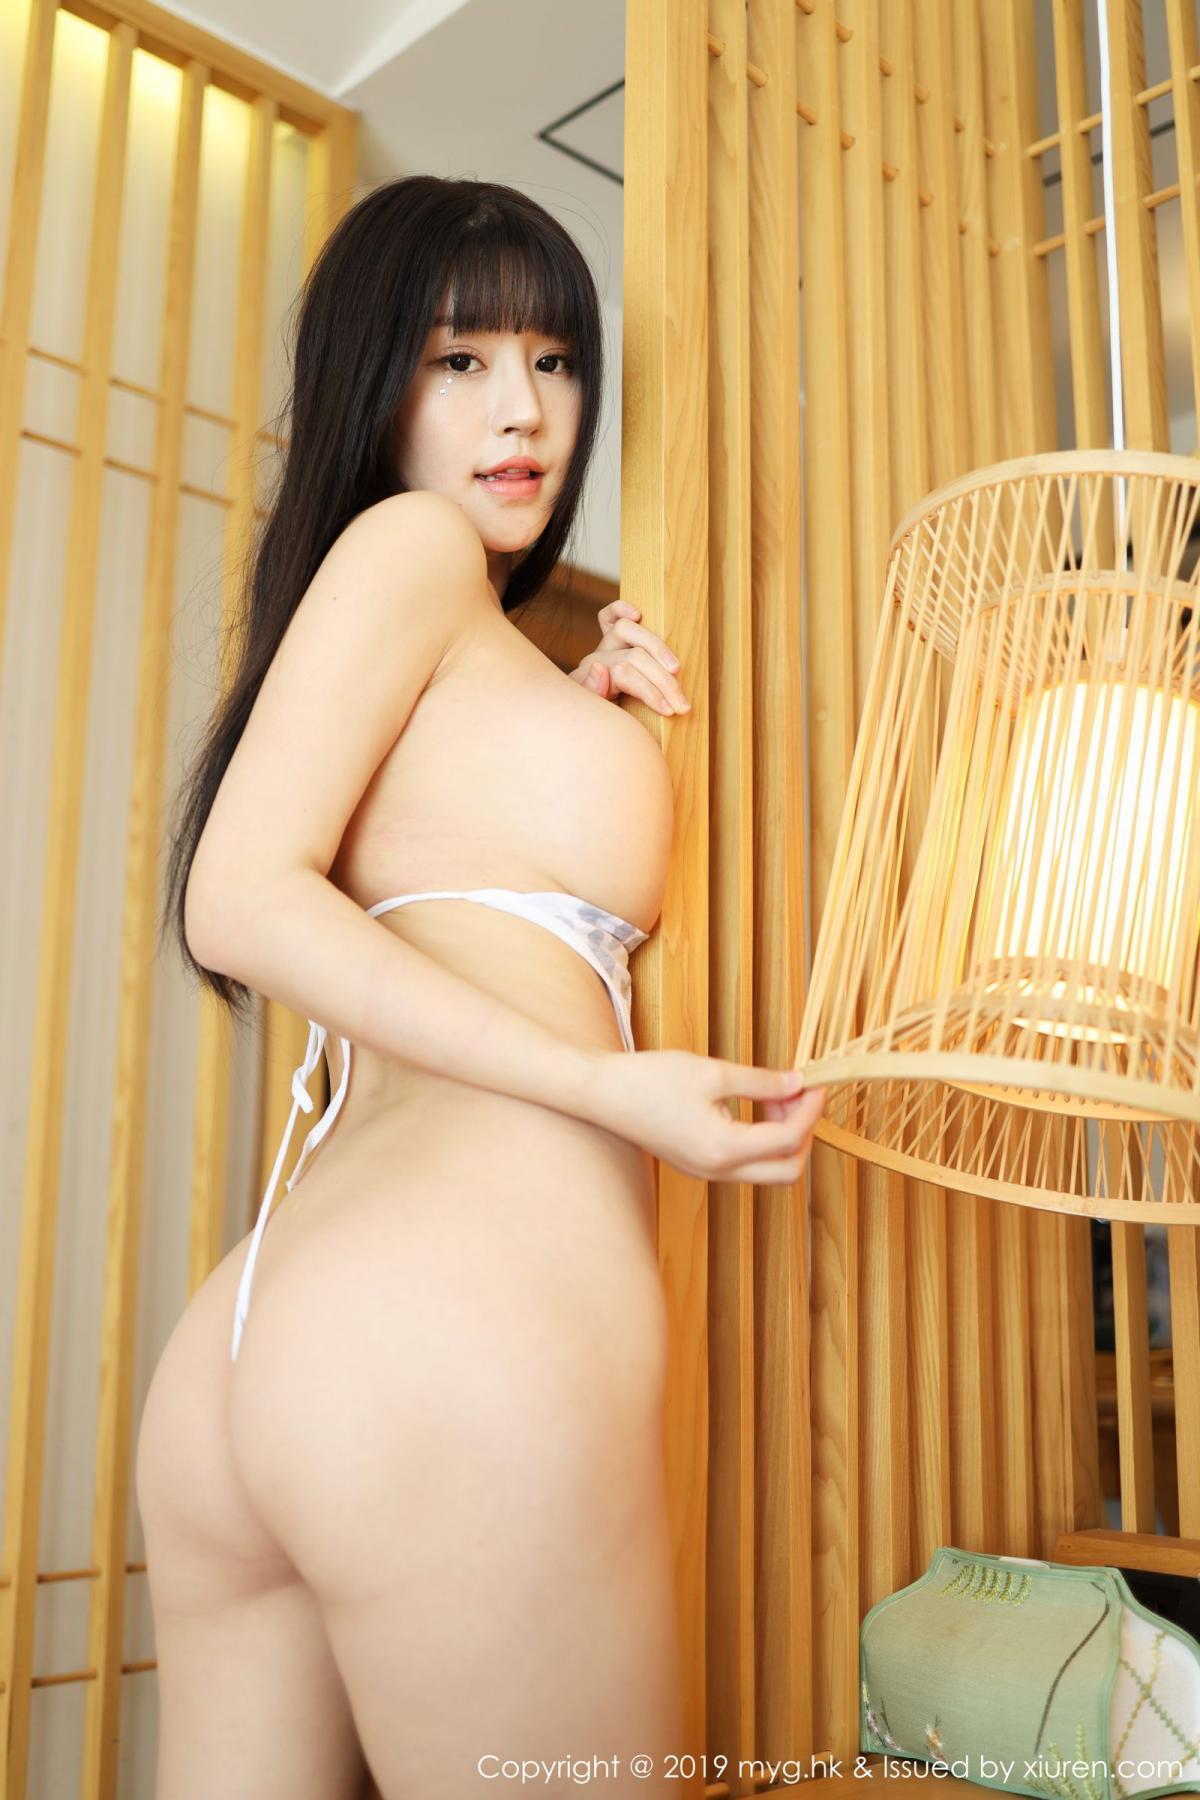 [MyGirl] Vol.370 Zhu Ke Er 60P, mygirl, Underwear, Zhu Ke Er